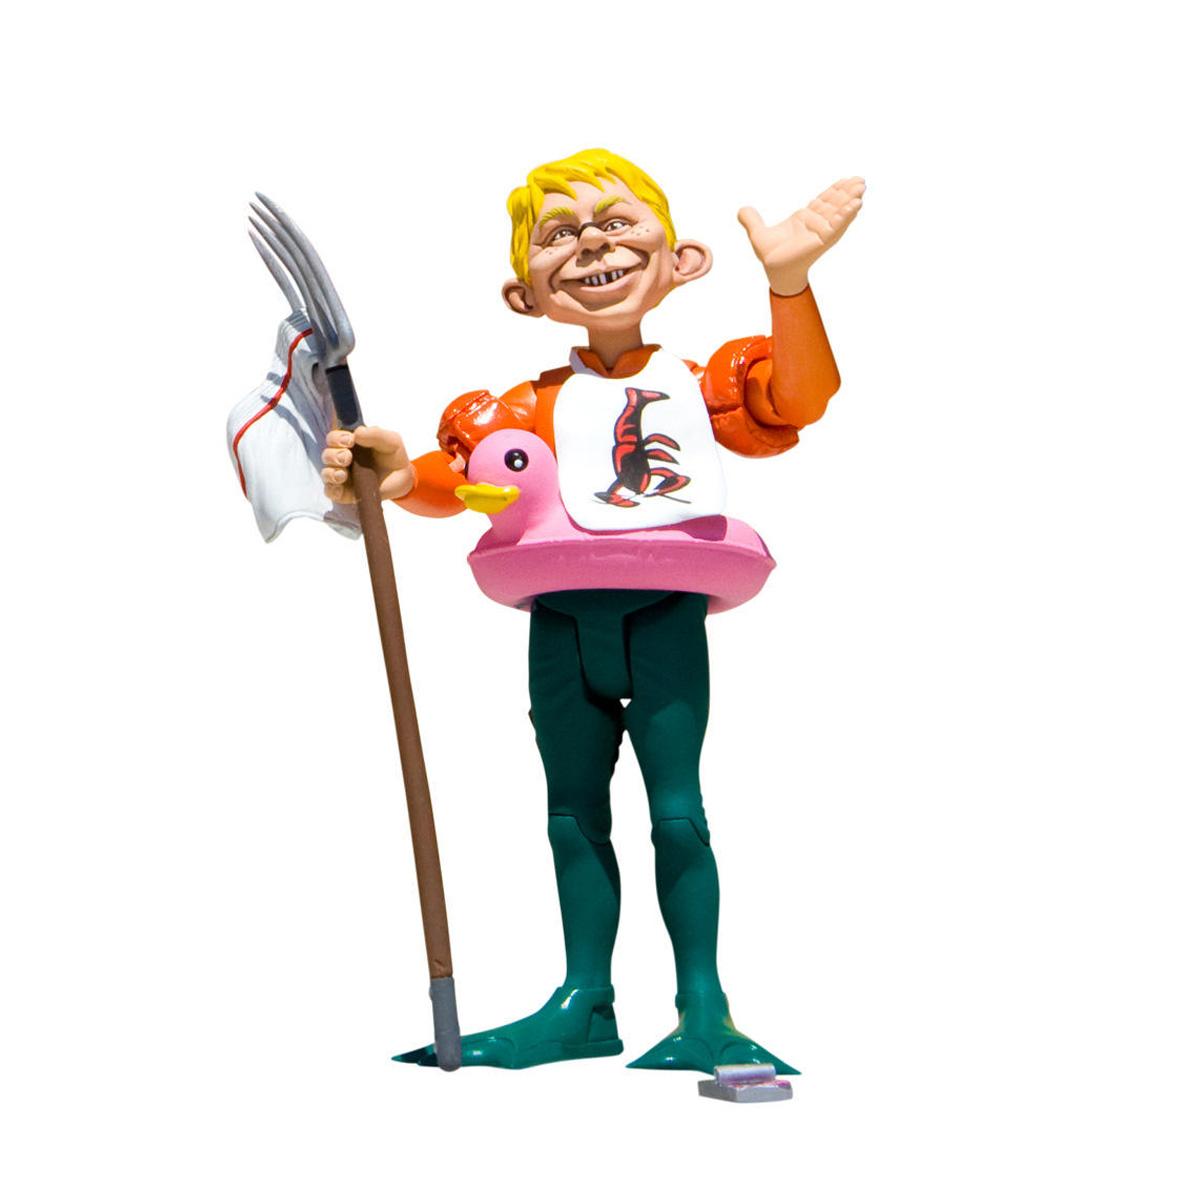 Boneco (Action Figure) MAD Just-Us League Aquaman